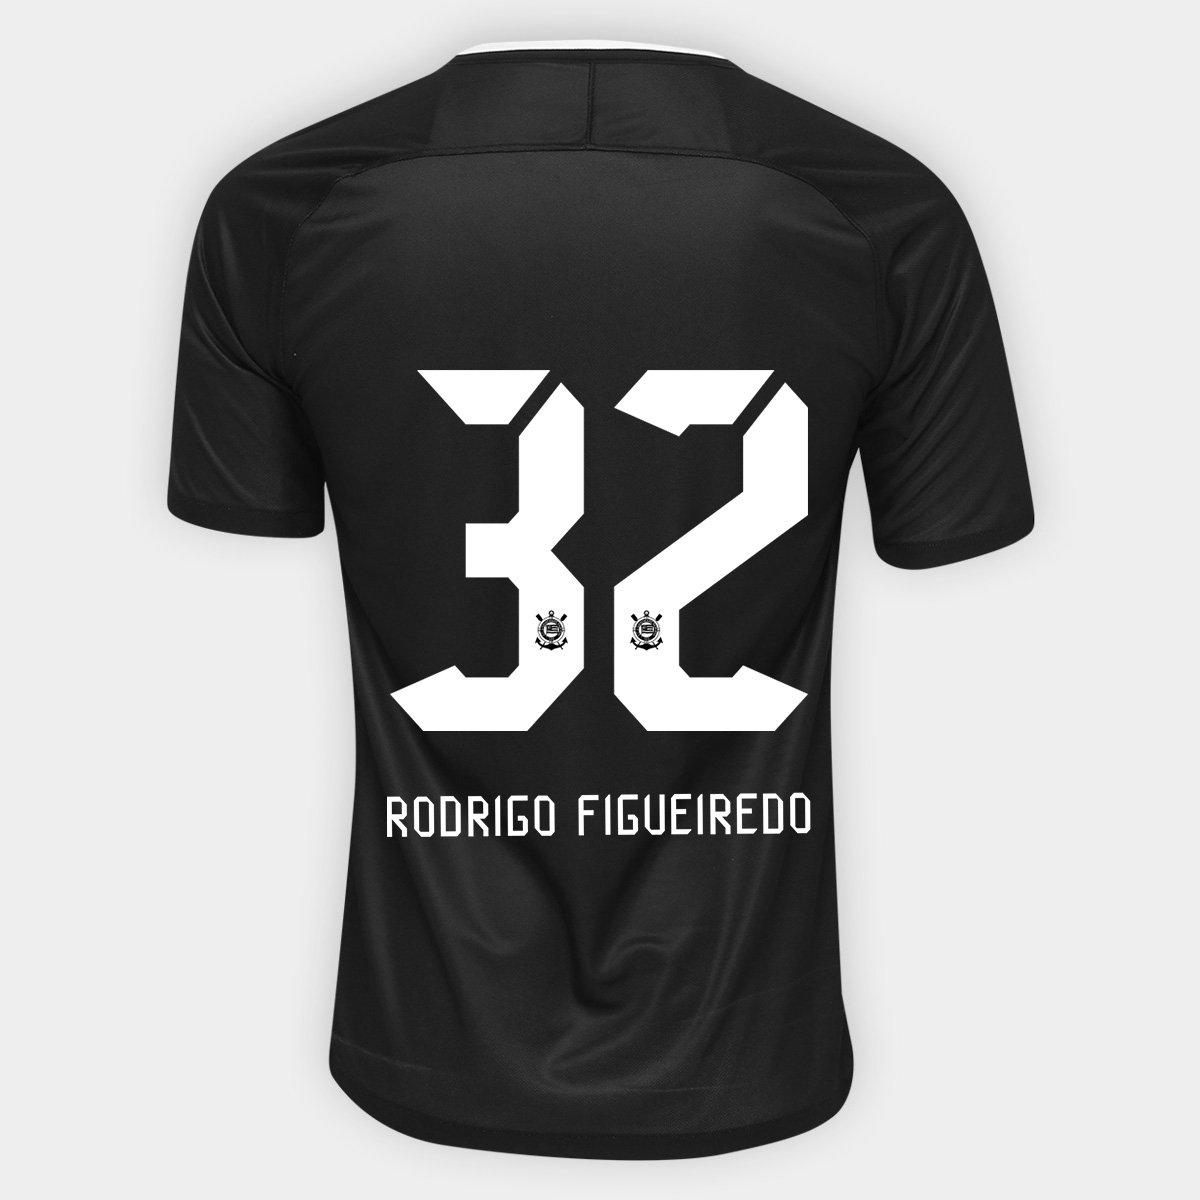 Camisa Corinthians II 17 18 nº 32 Rodrigo Figueiredo - Torcedor Nike  Masculina - Compre Agora  efd4f8574c4ea